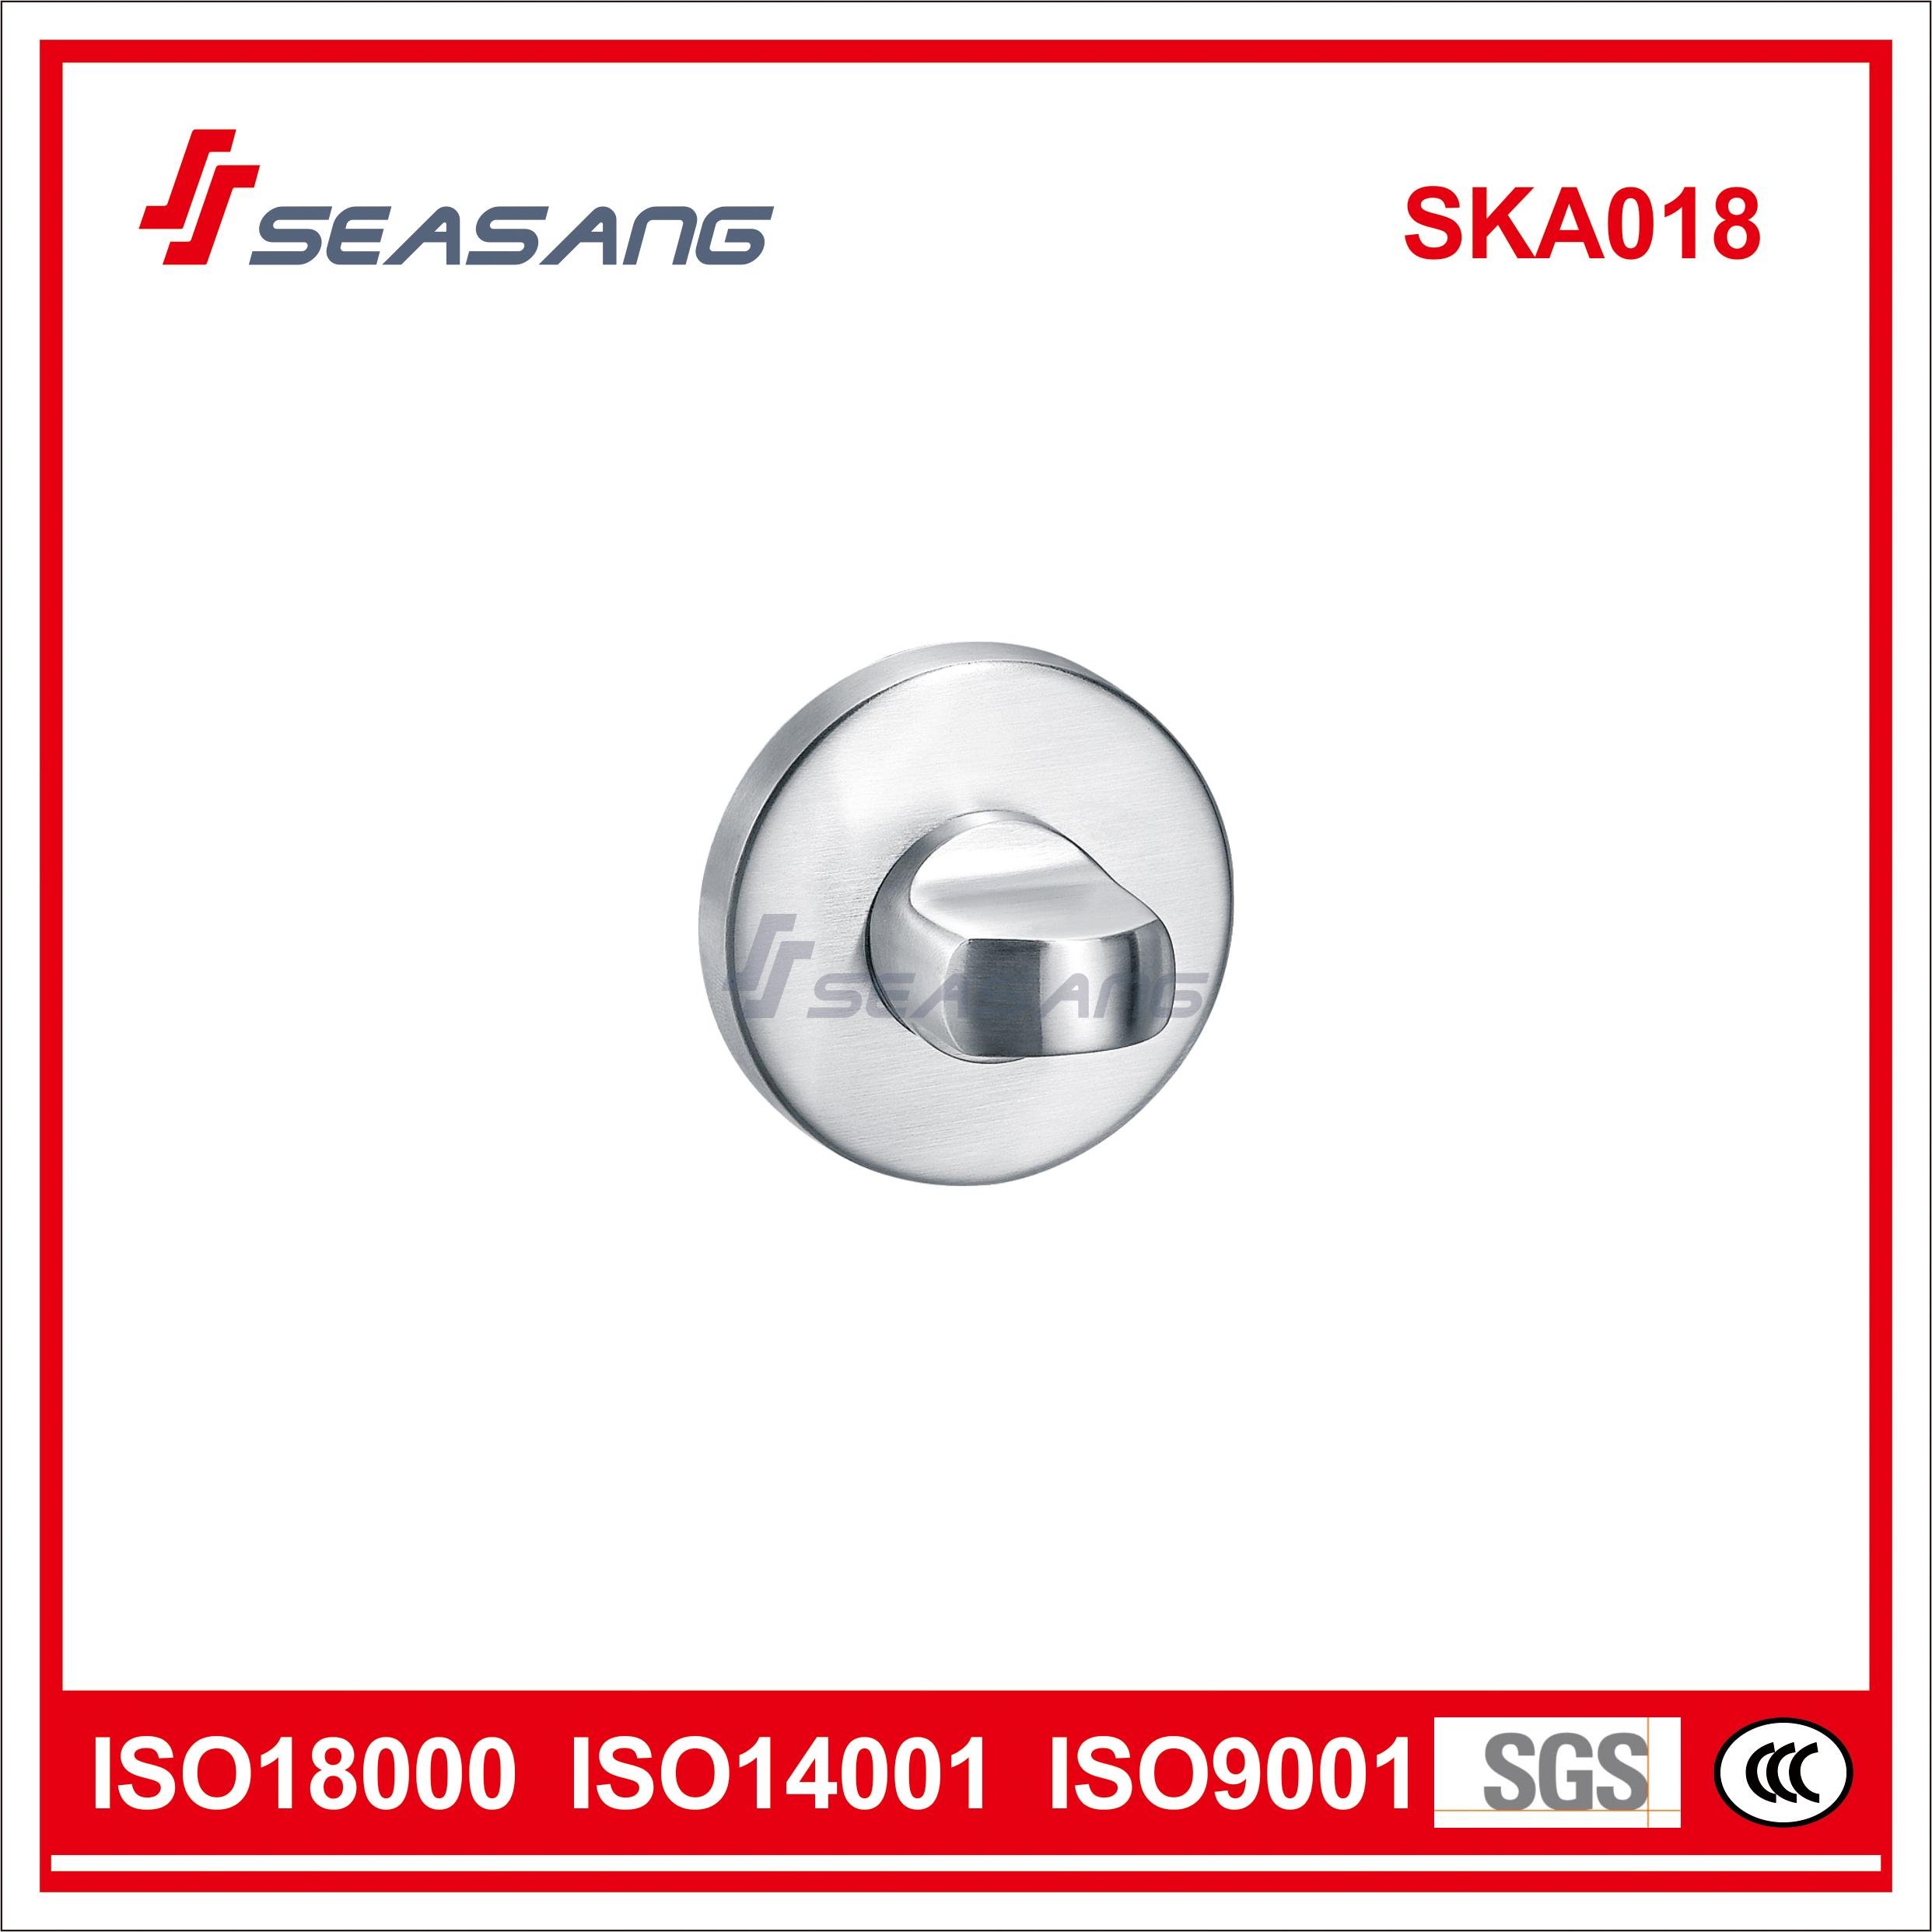 Stainless Steel Bathroom Handle Ska018